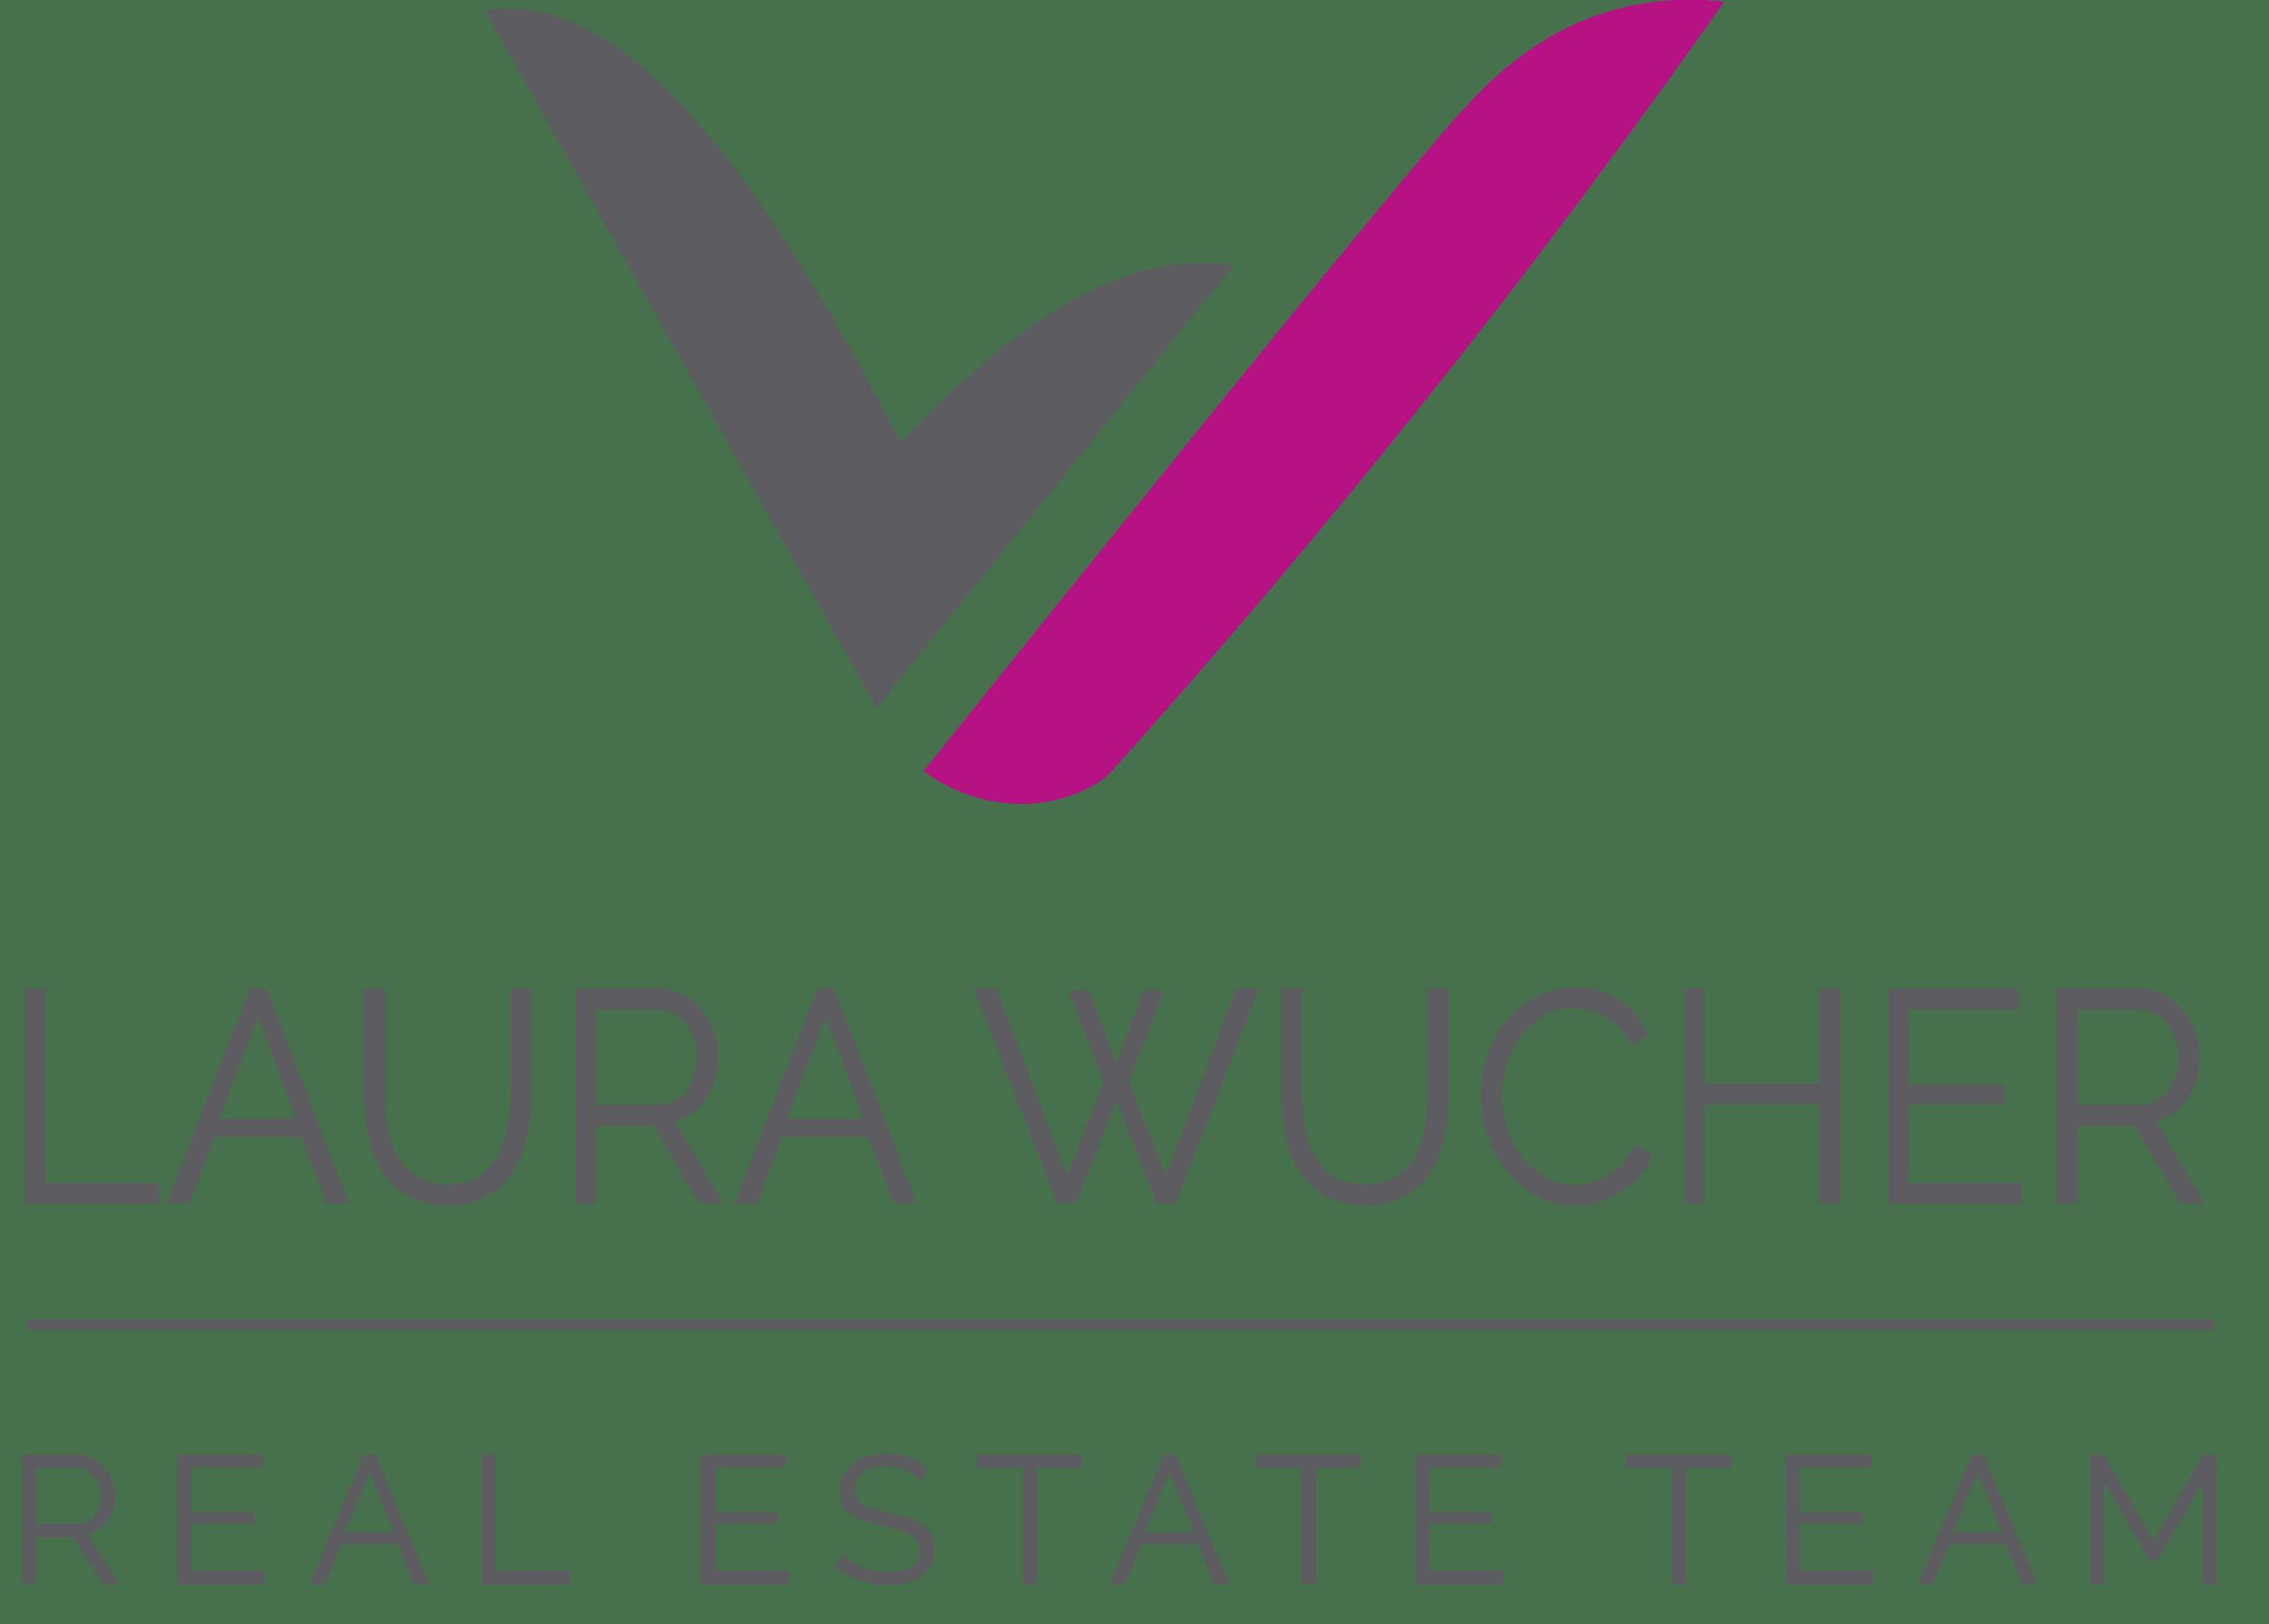 Laura Wucher logo Opens in new window